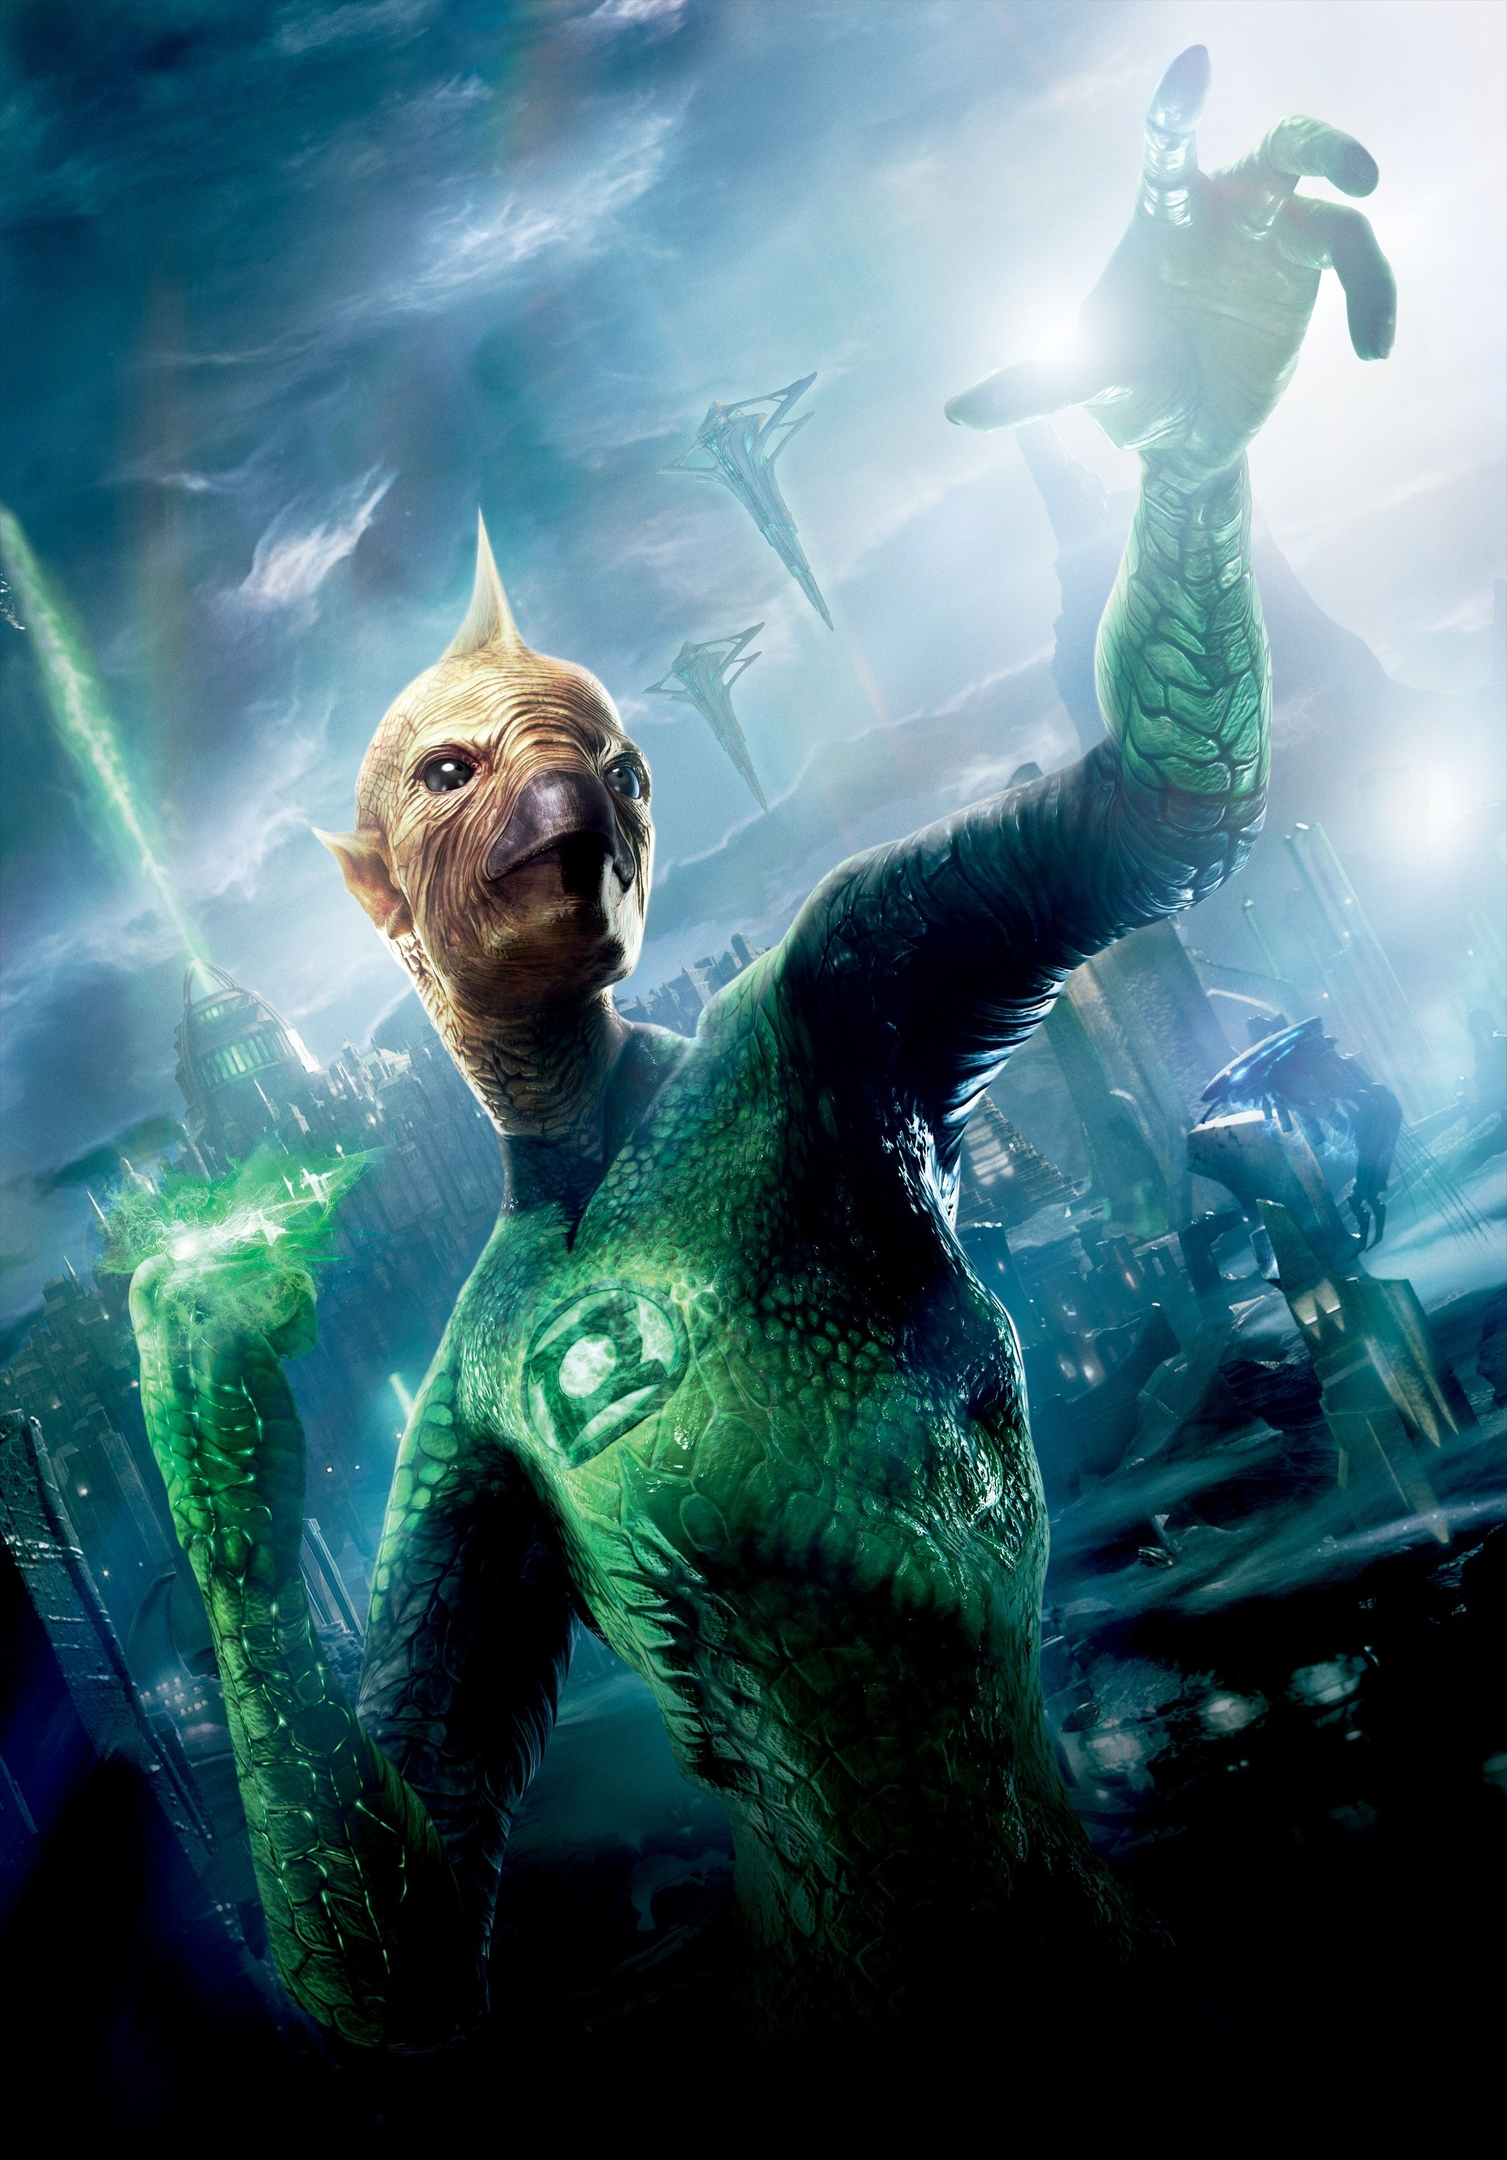 Tomar-Re (Green Lantern Movie)